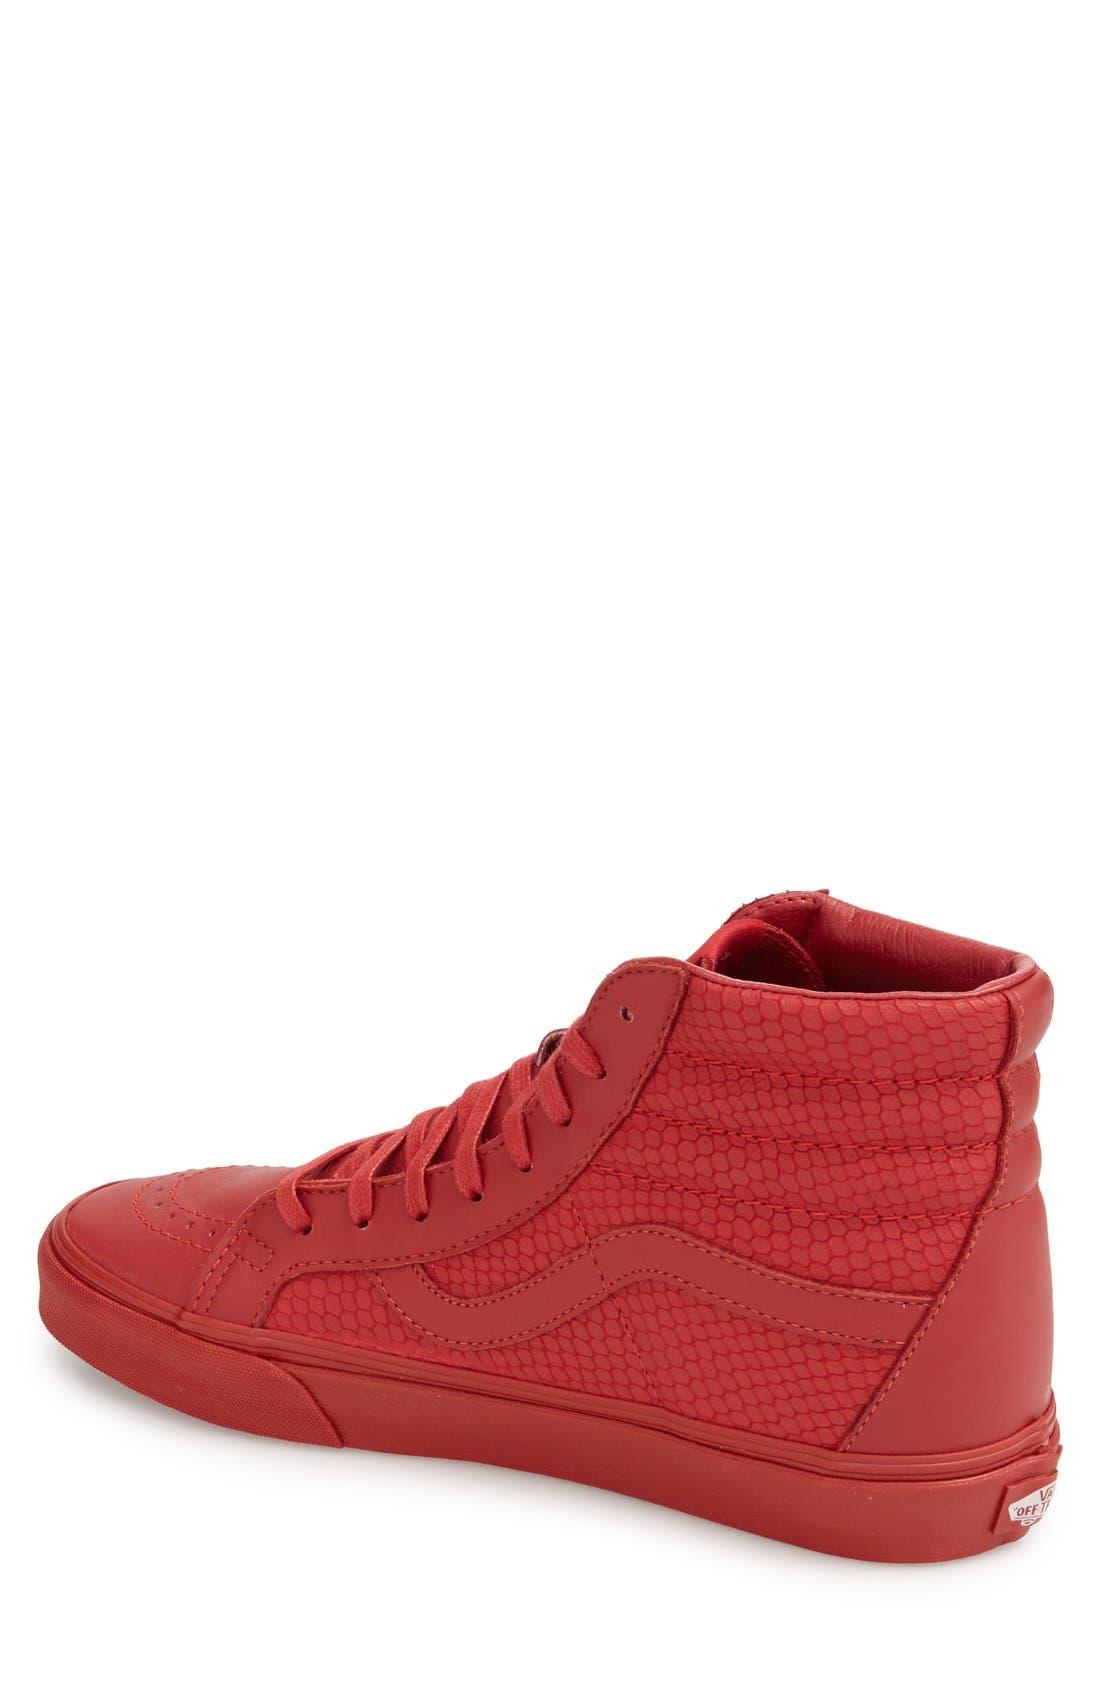 Alternate Image 2  - Vans 'Sk8-Hi Reissue Plus' Sneaker (Men)